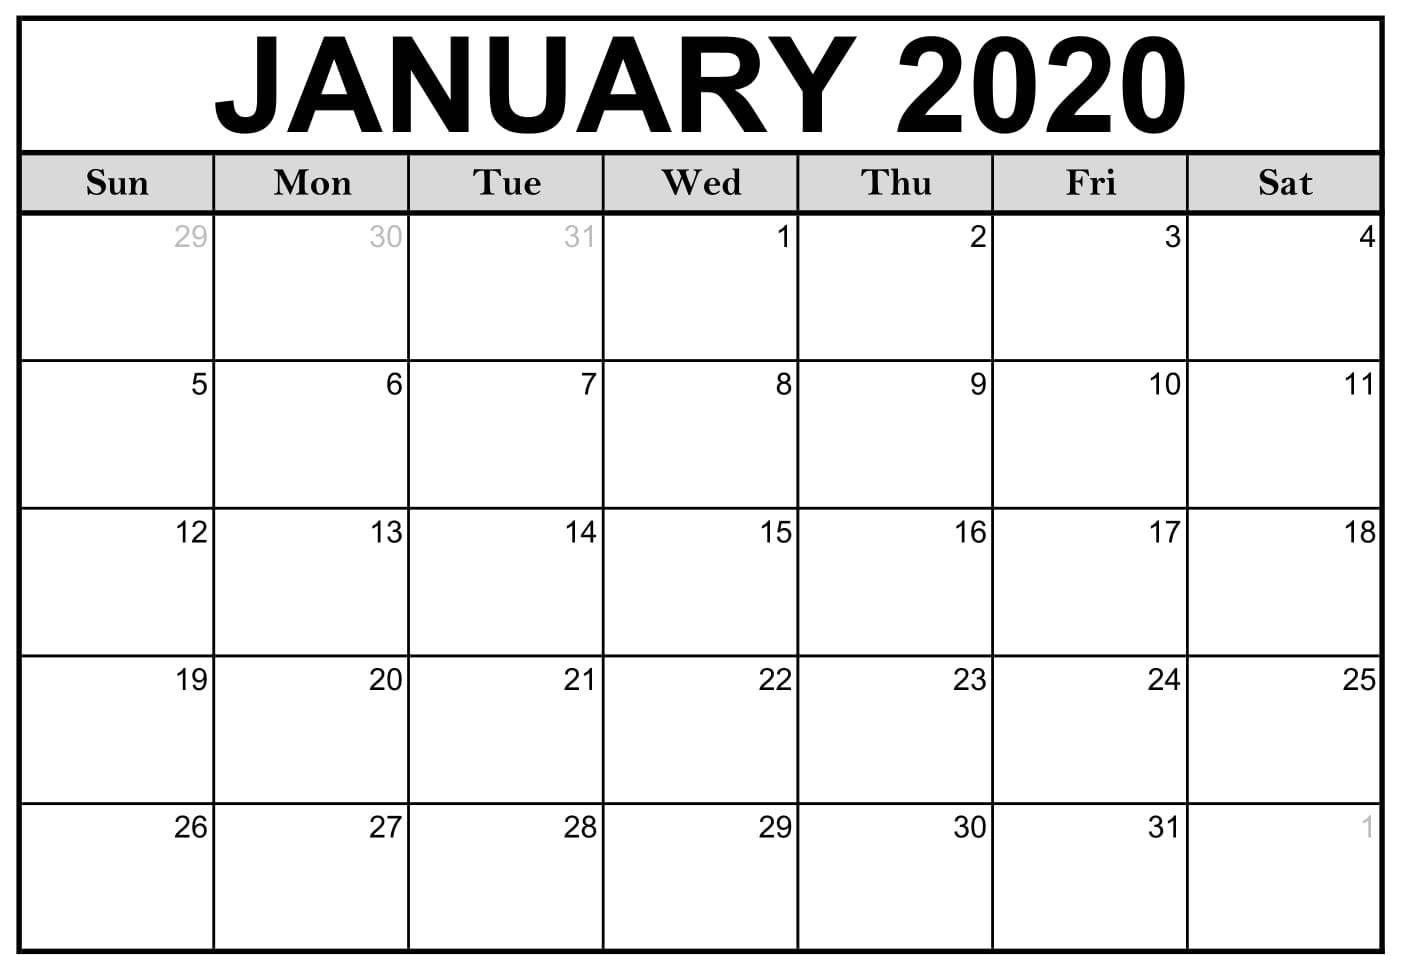 January Calendar 2020 Layout